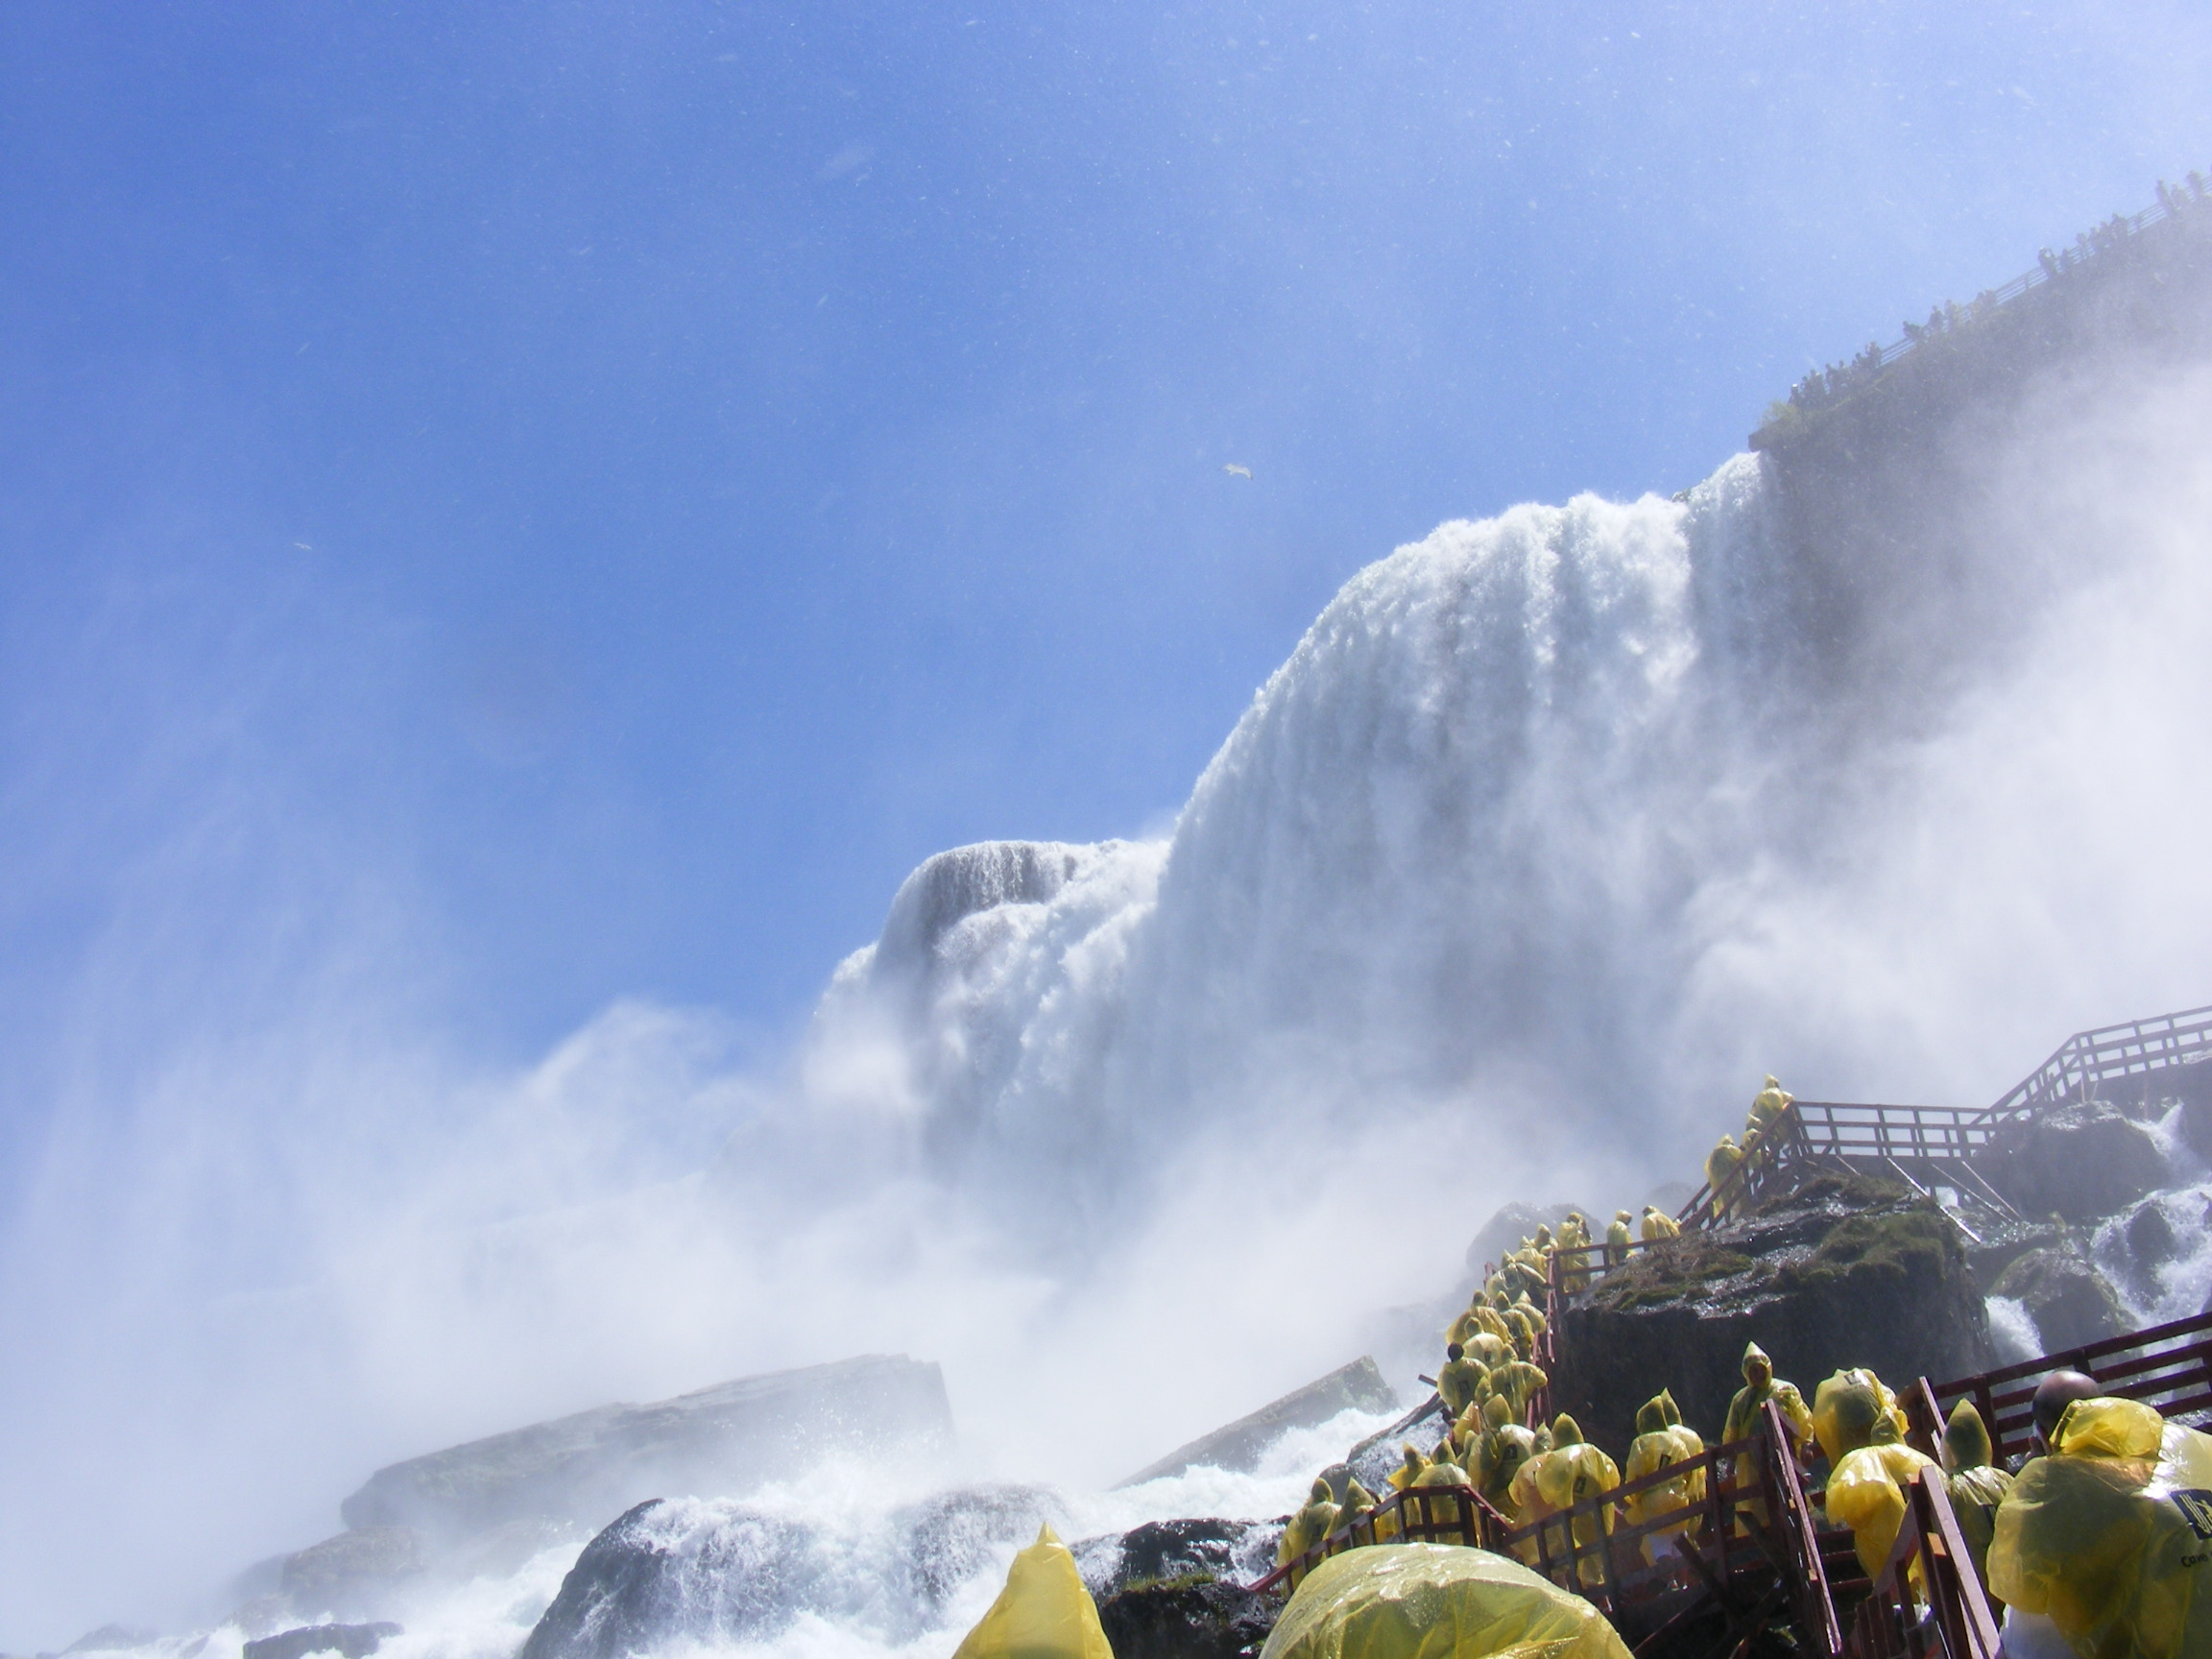 Beauty of niagara falls photo